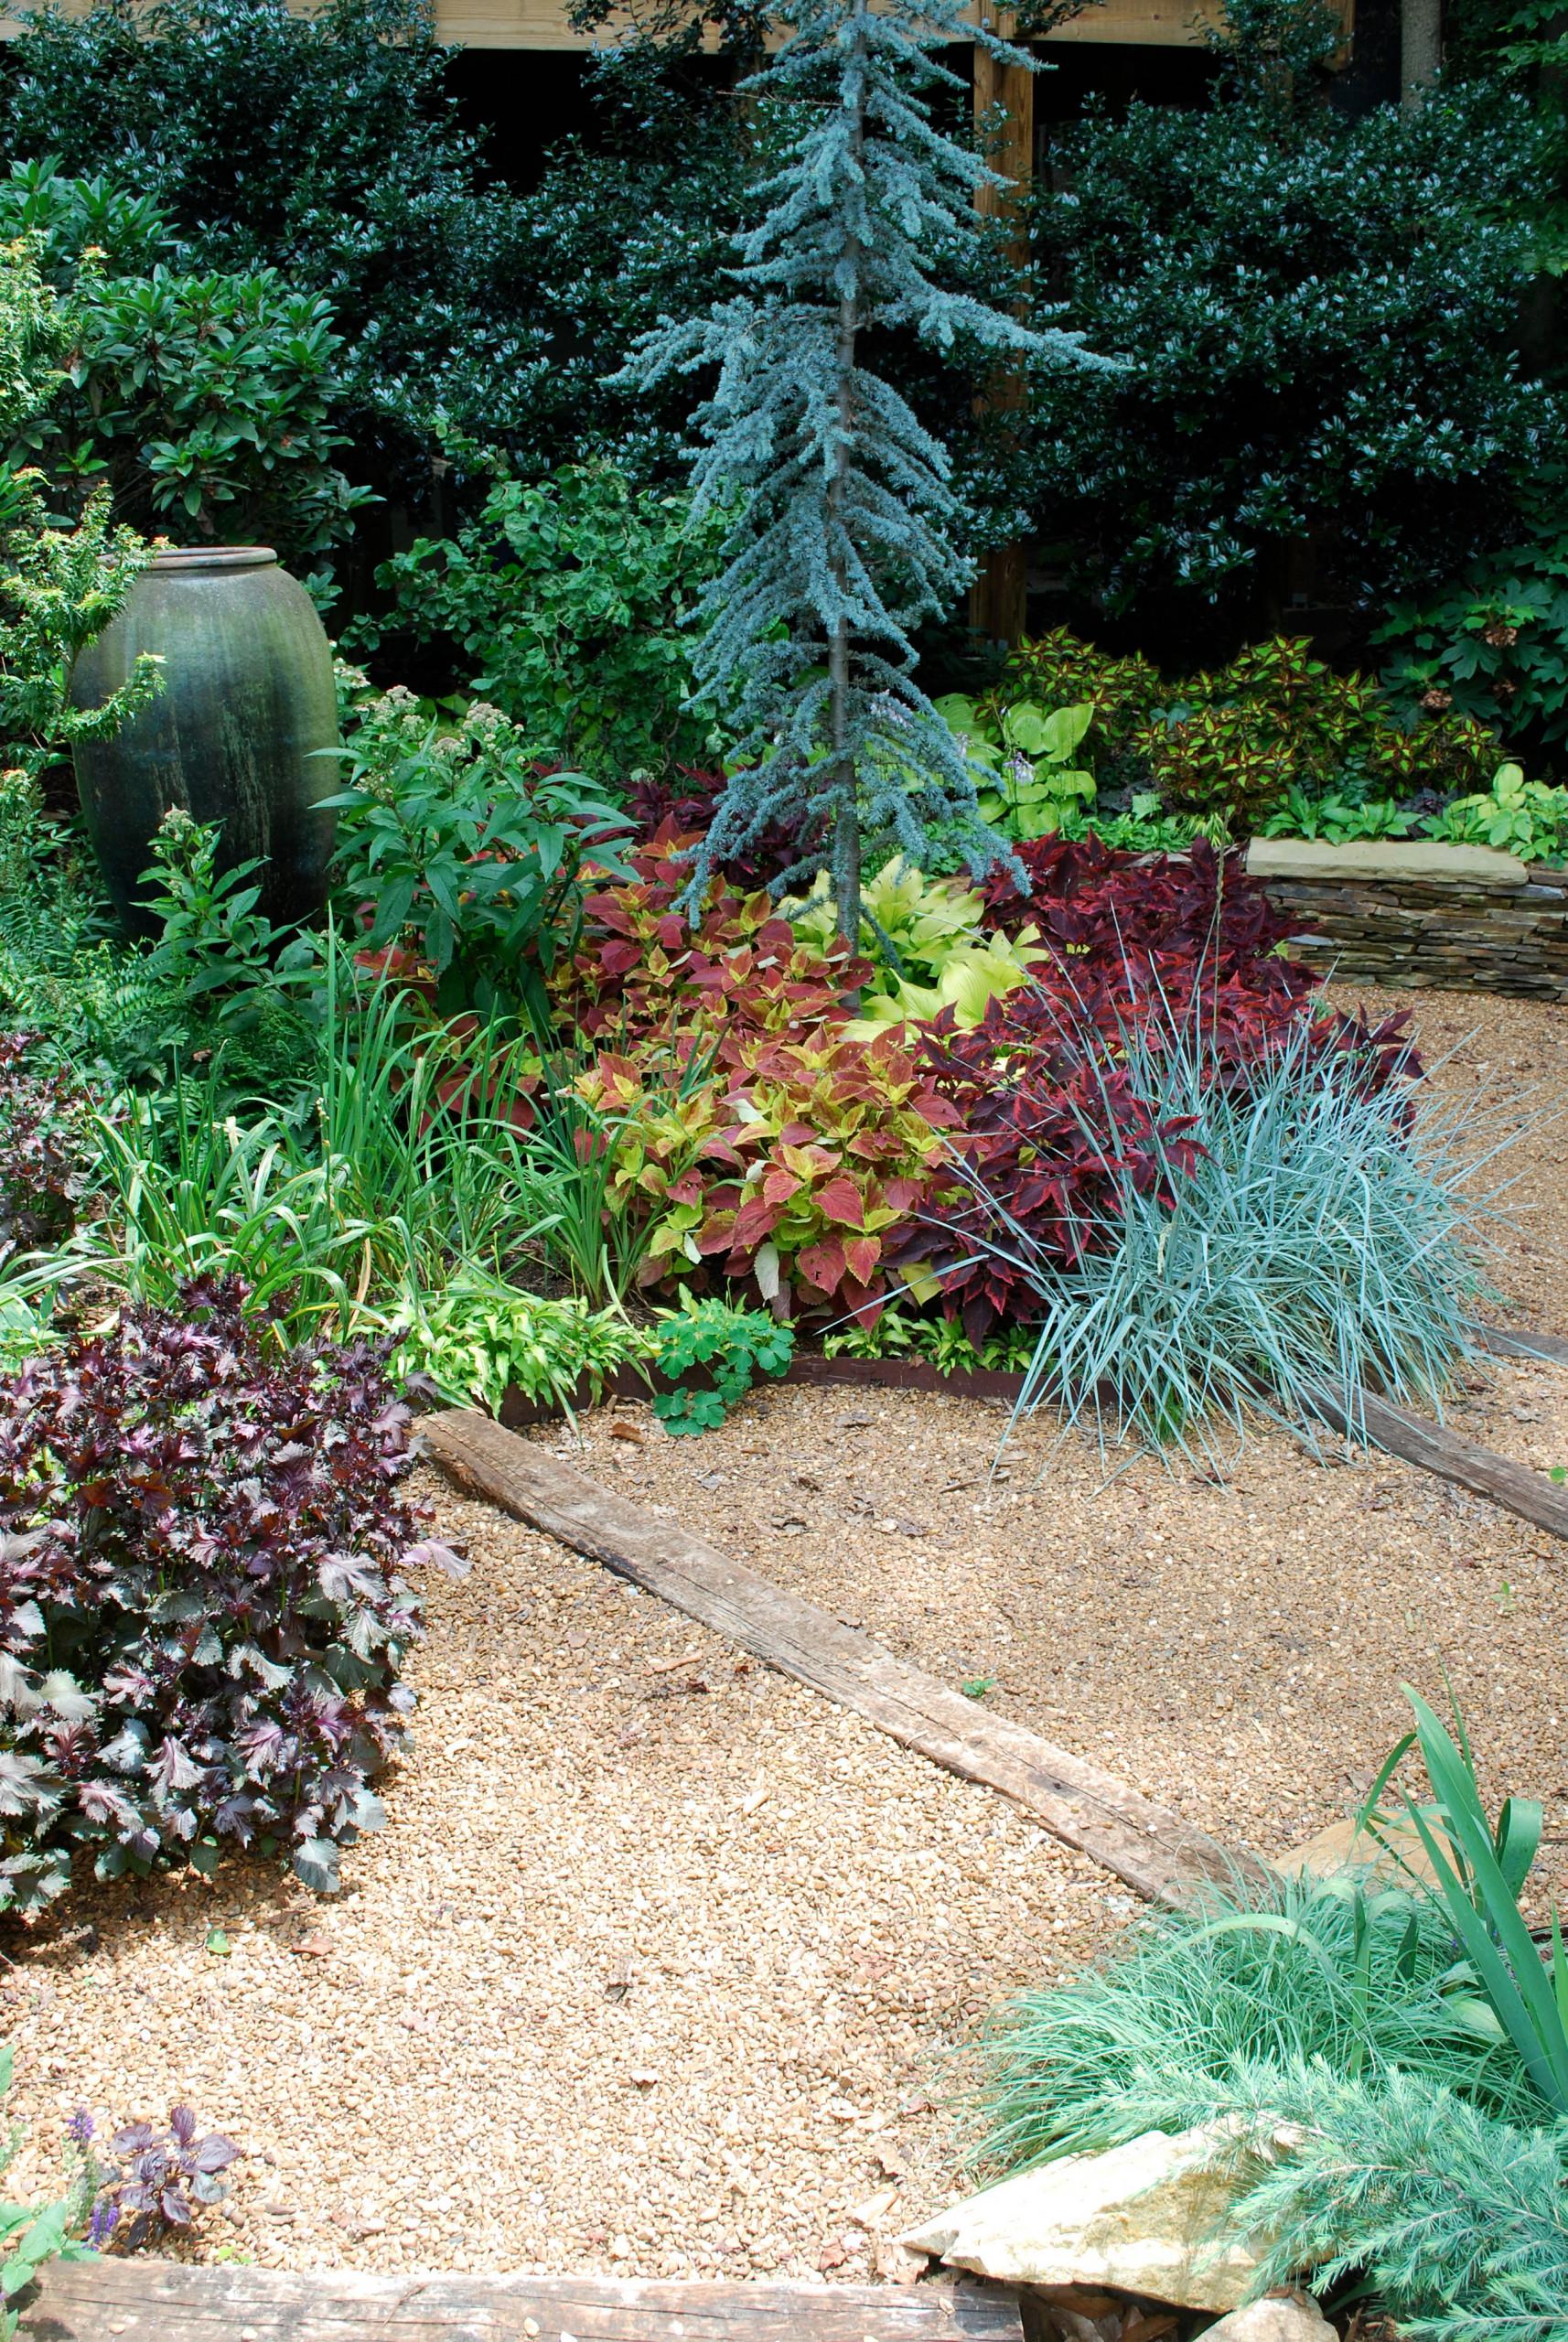 Lawnless front garden.